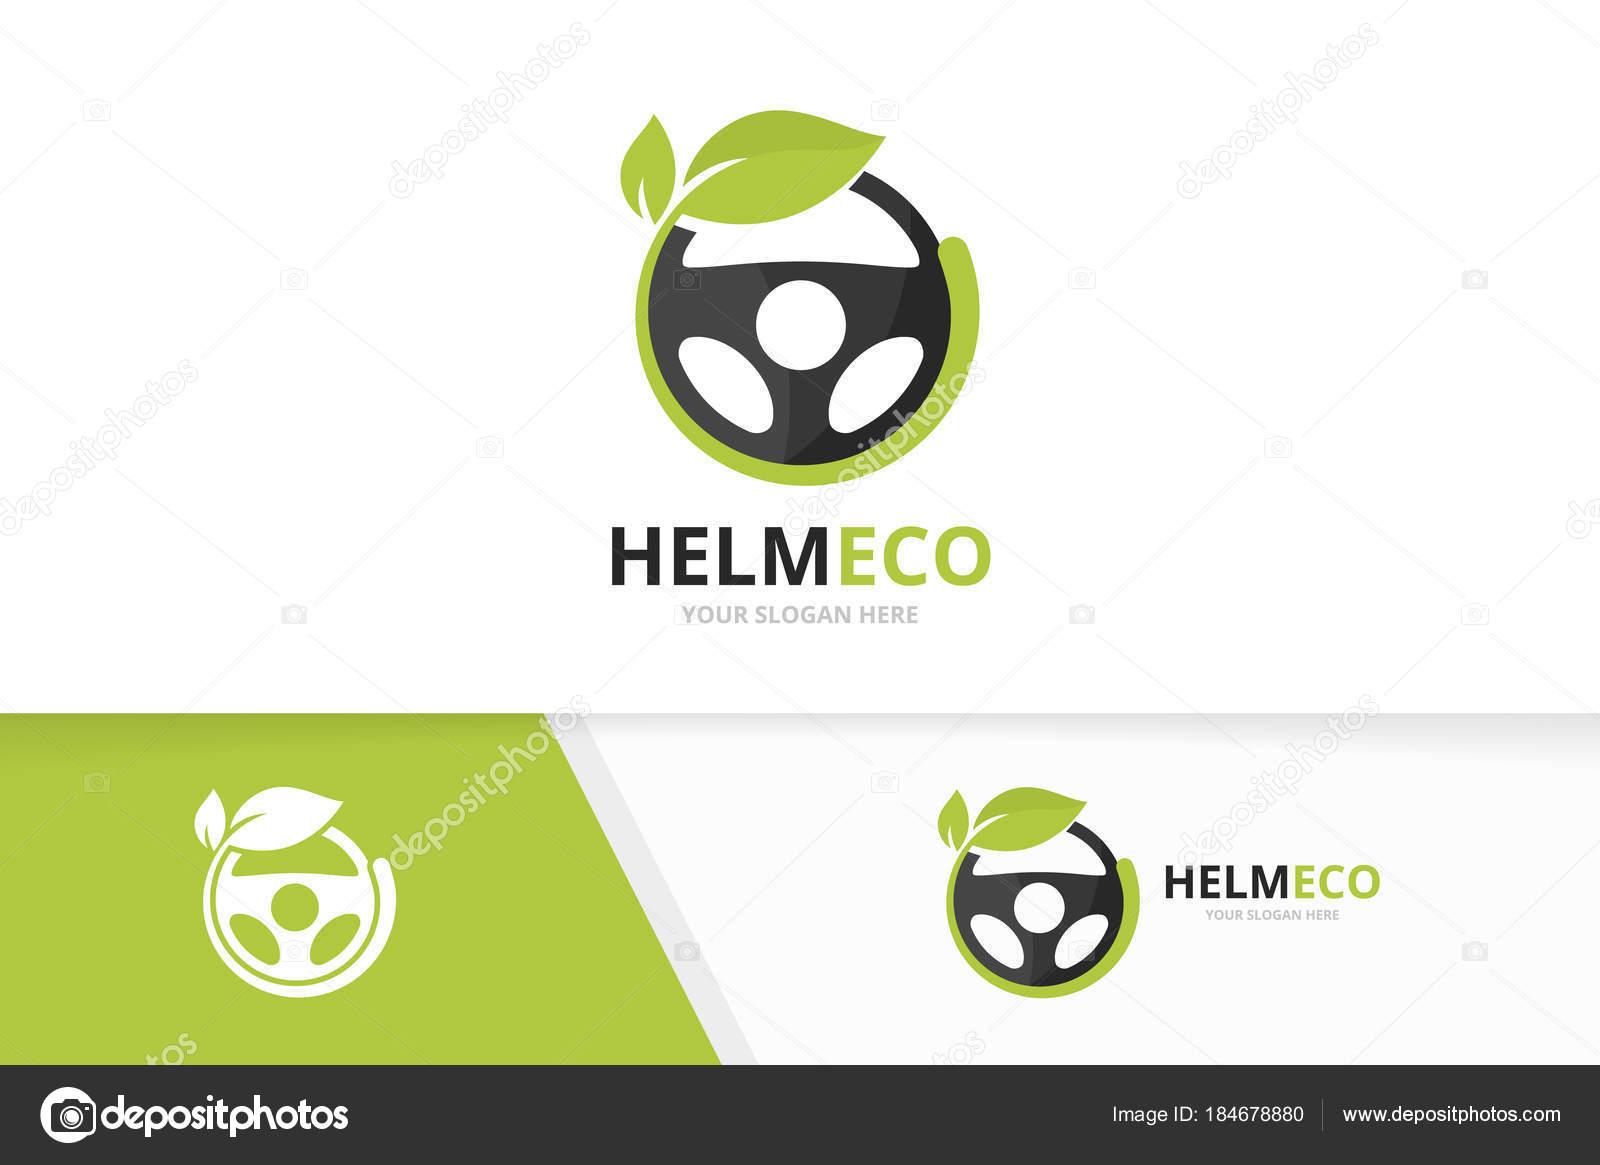 Vektor Auto Helm und Blatt Logo Kombination. Lenkrad und Eco-Symbol ...